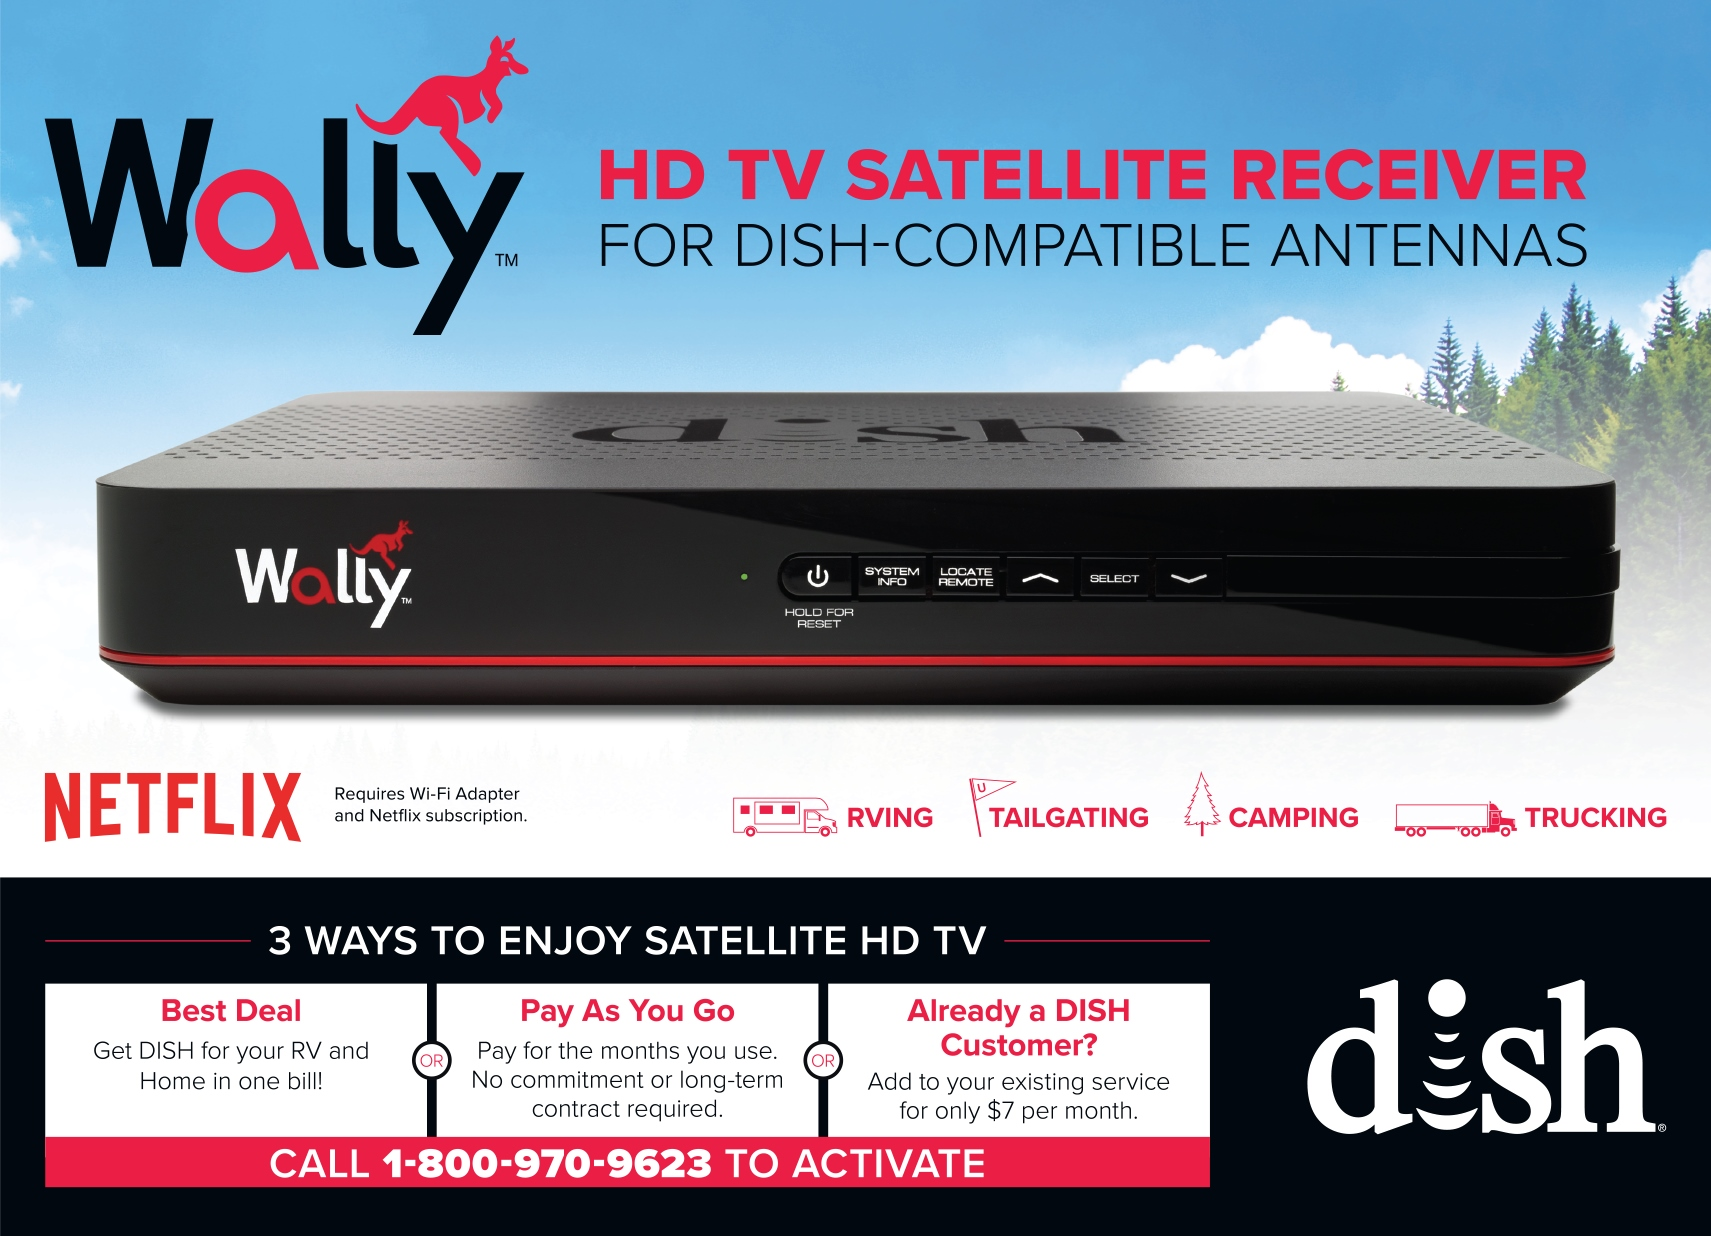 DISH Wally Single Tuner HD Satellite Receiver | Winegard Company